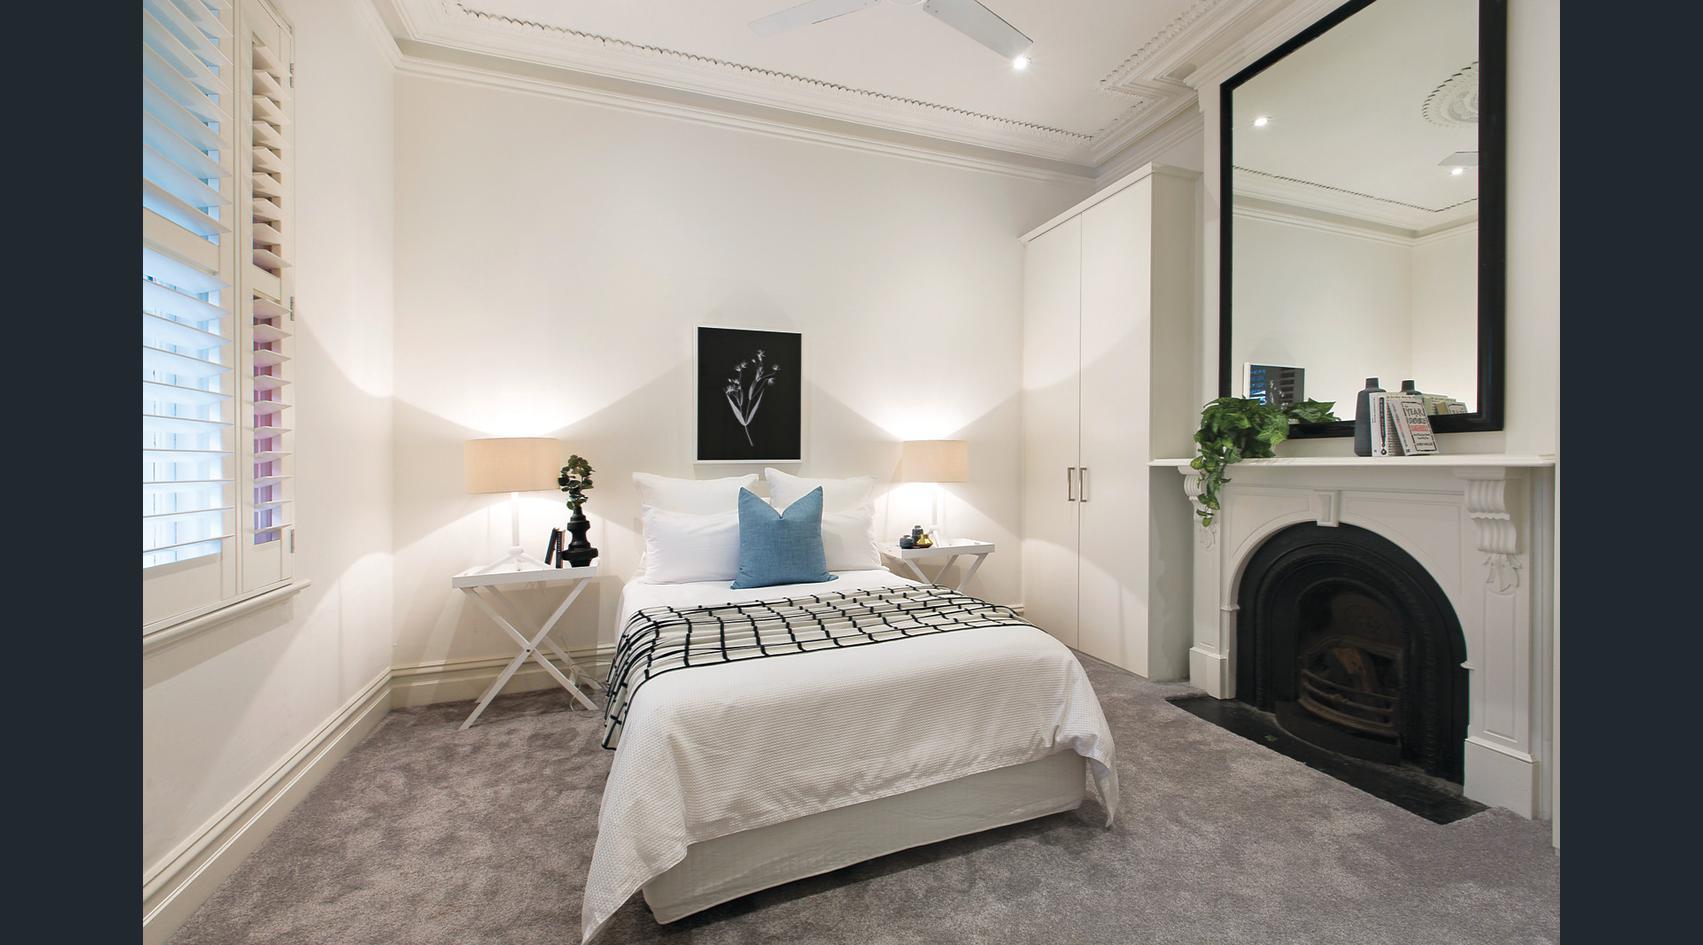 178-farrell-street-port-melbourne-student-accommodation-Melbourne-Bedroom2-Unilodgers